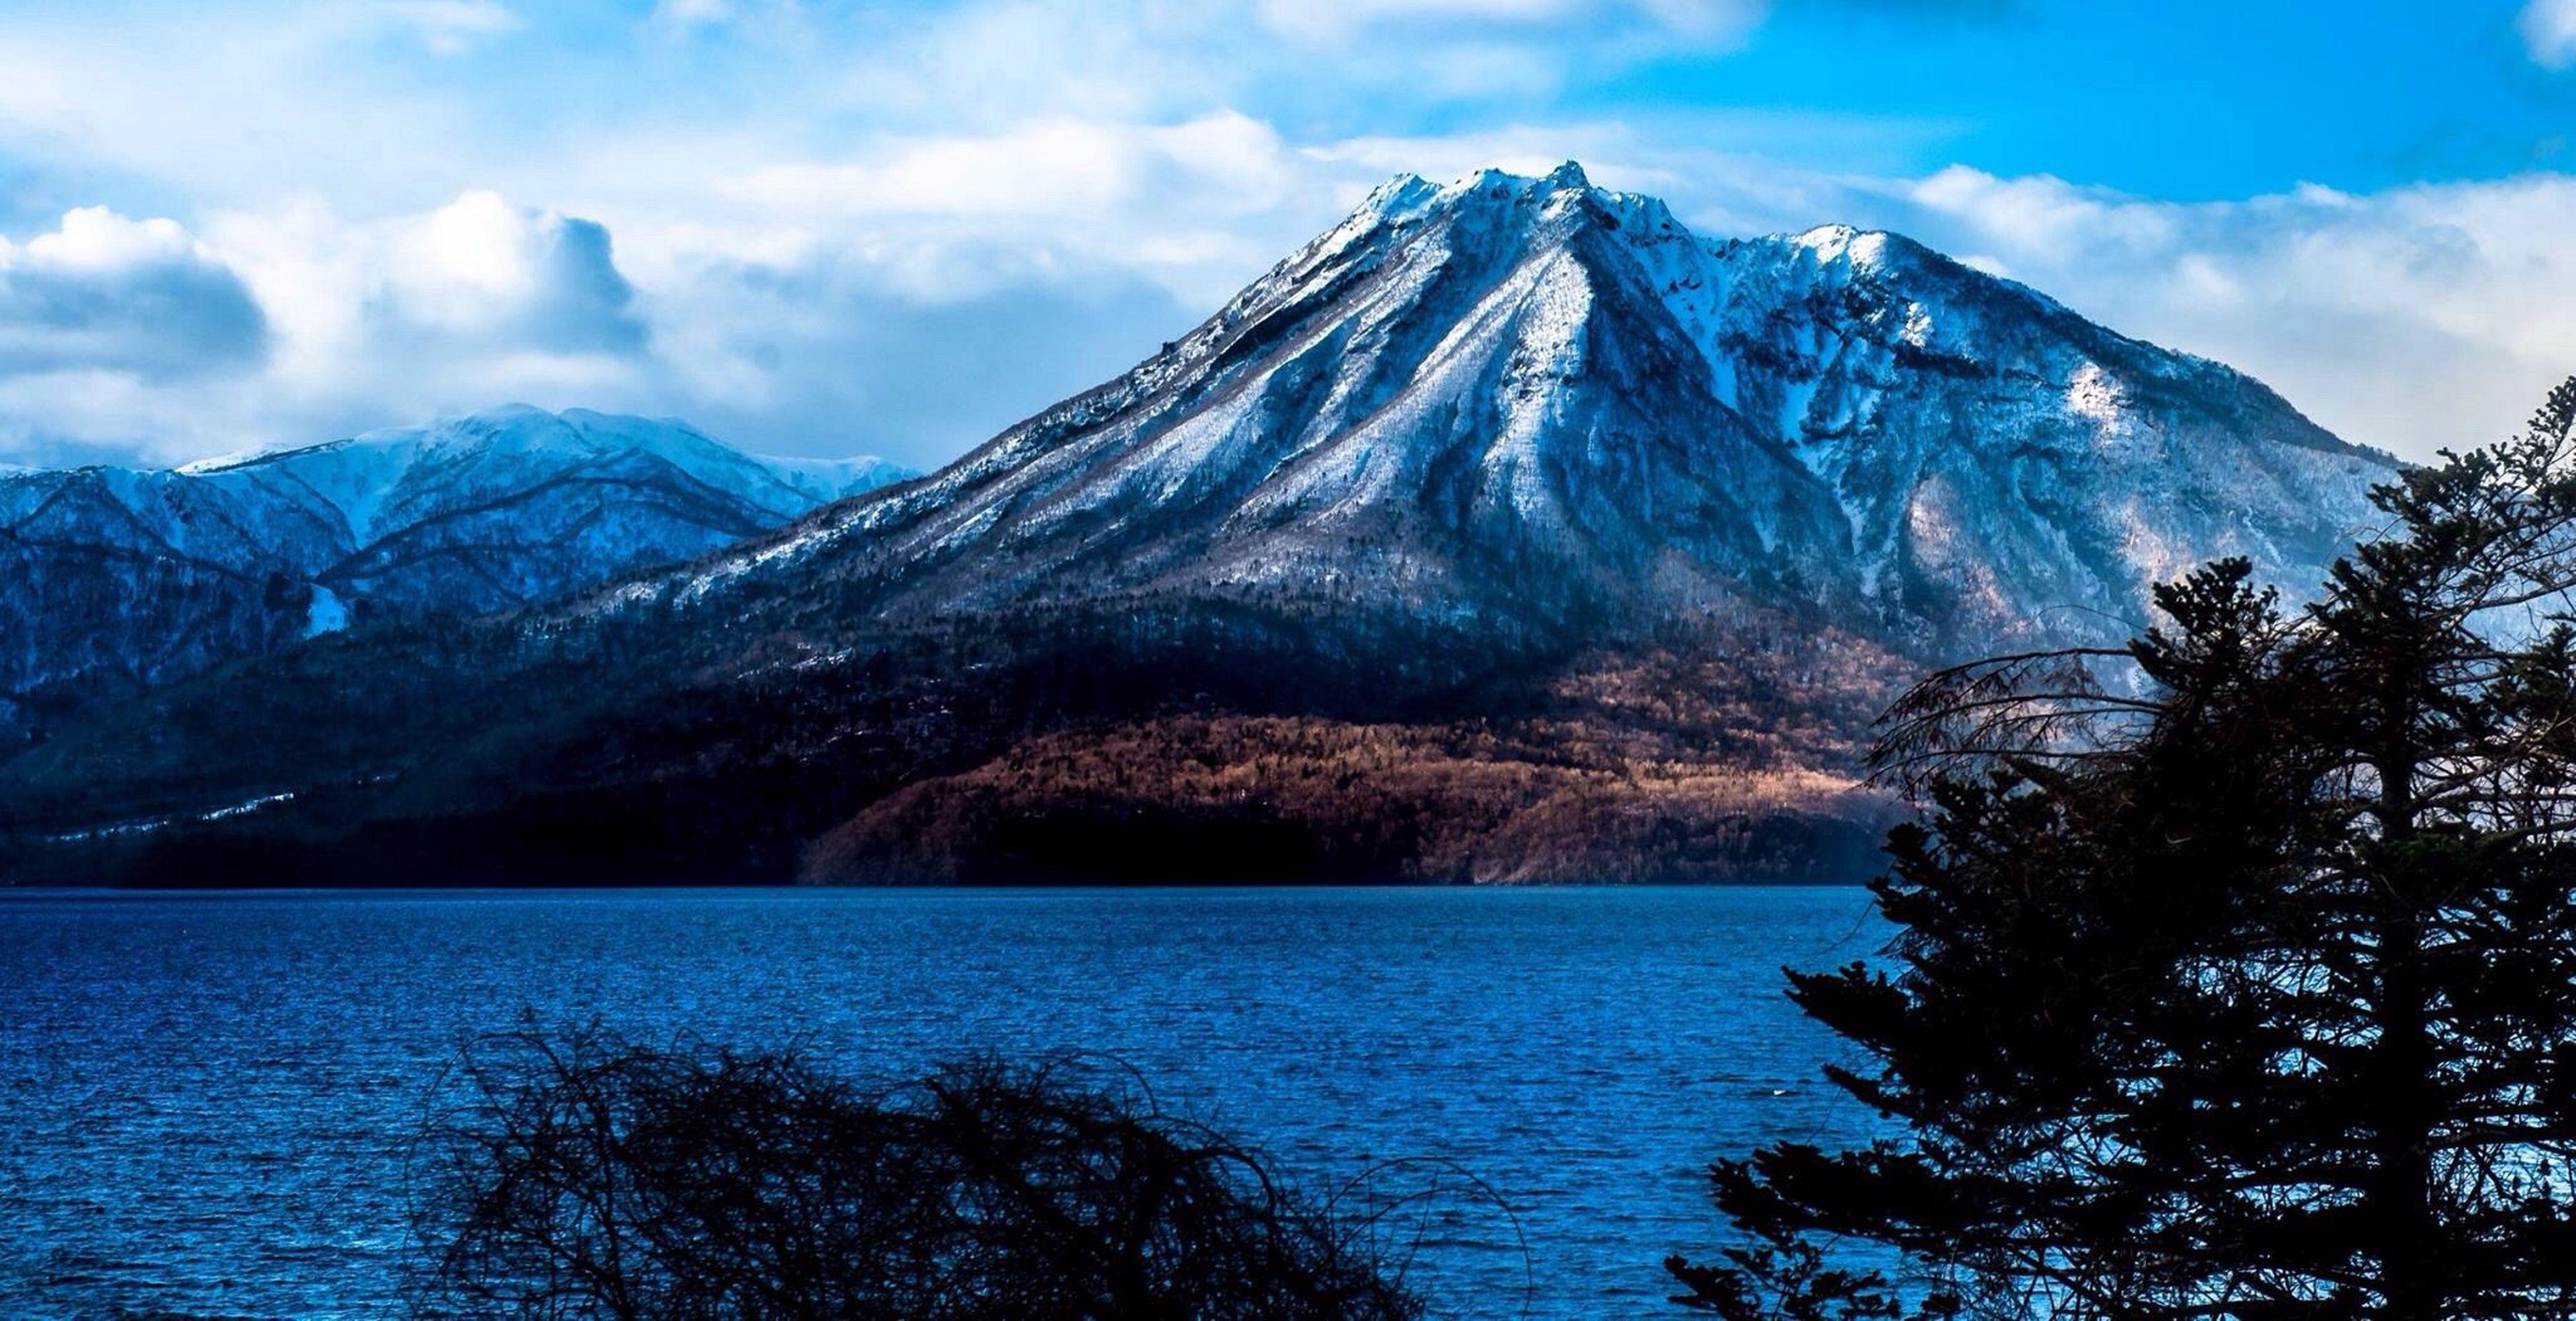 A mountain in Hokkaido, Japan Japan, Volcano, Lake, Sunset, Landscape